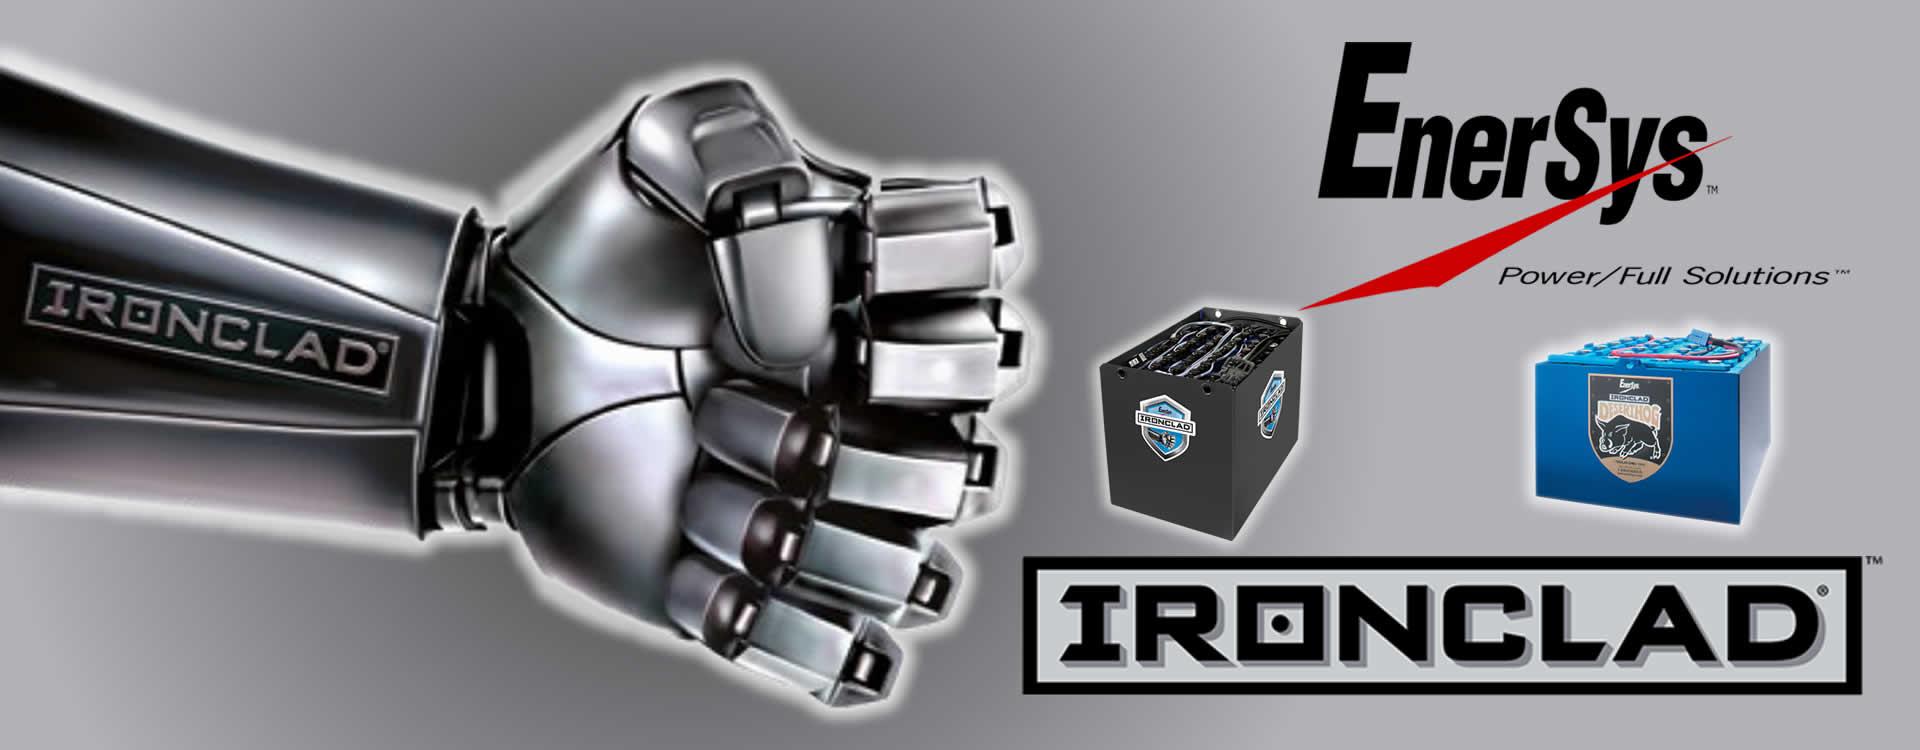 IronClad-Baterije-extrem